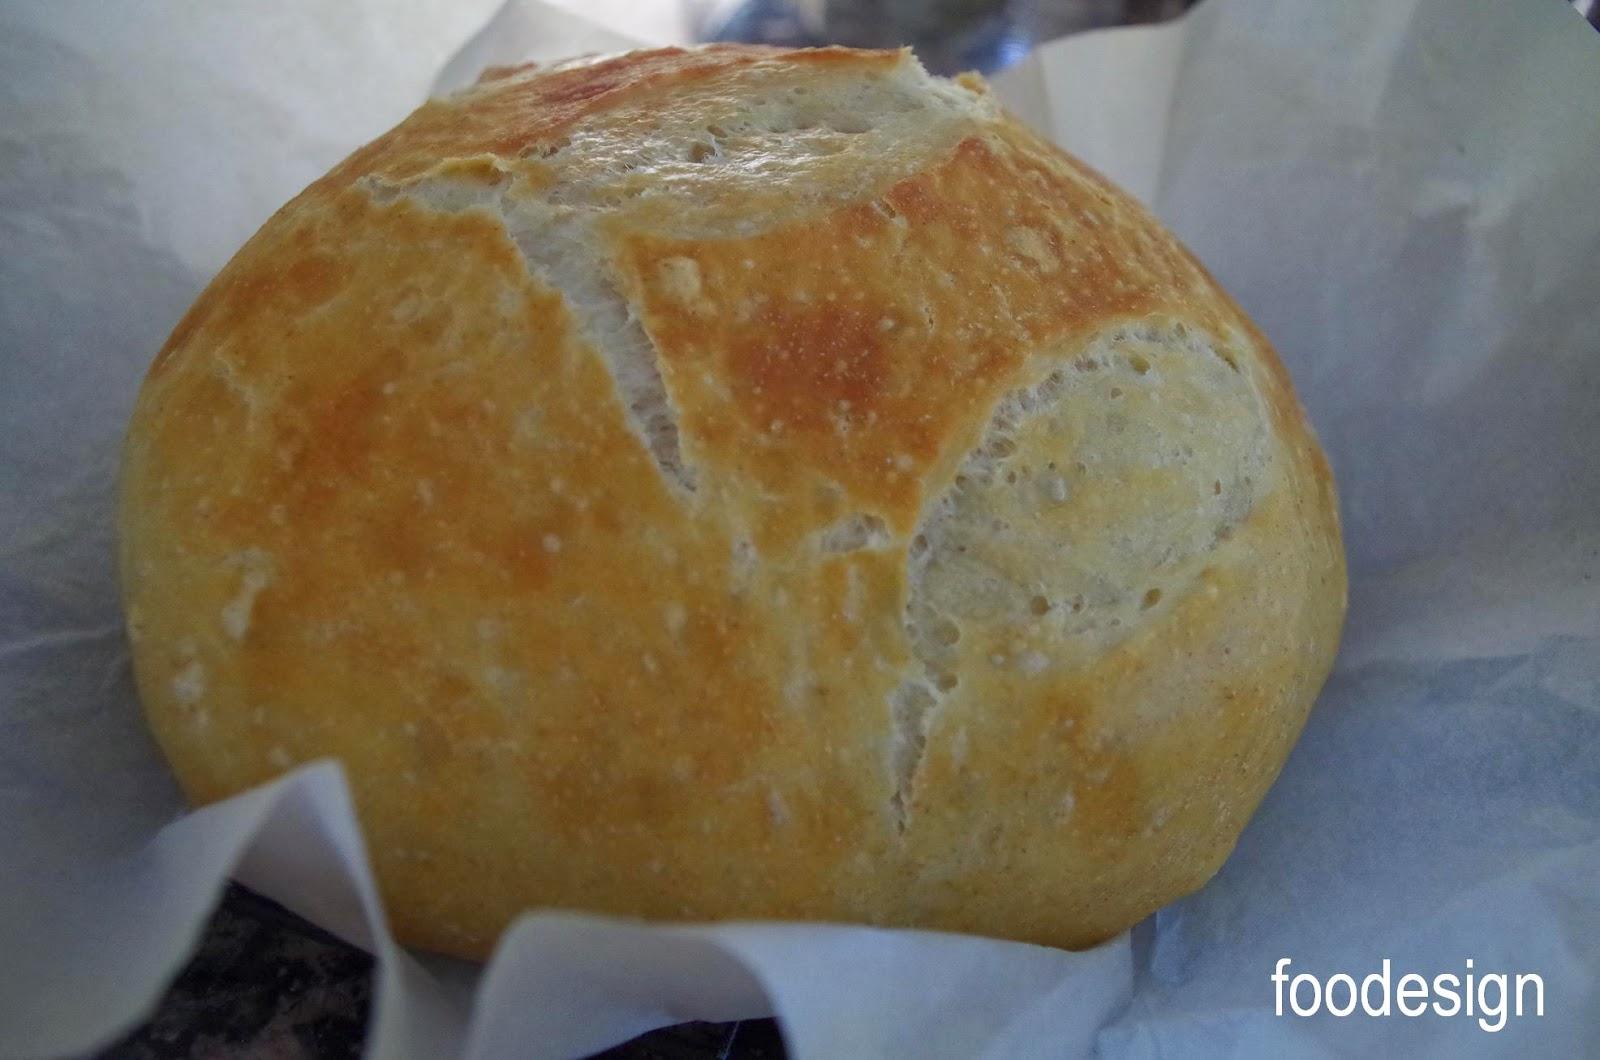 foodesign: weekend baking ~ no-knead bread